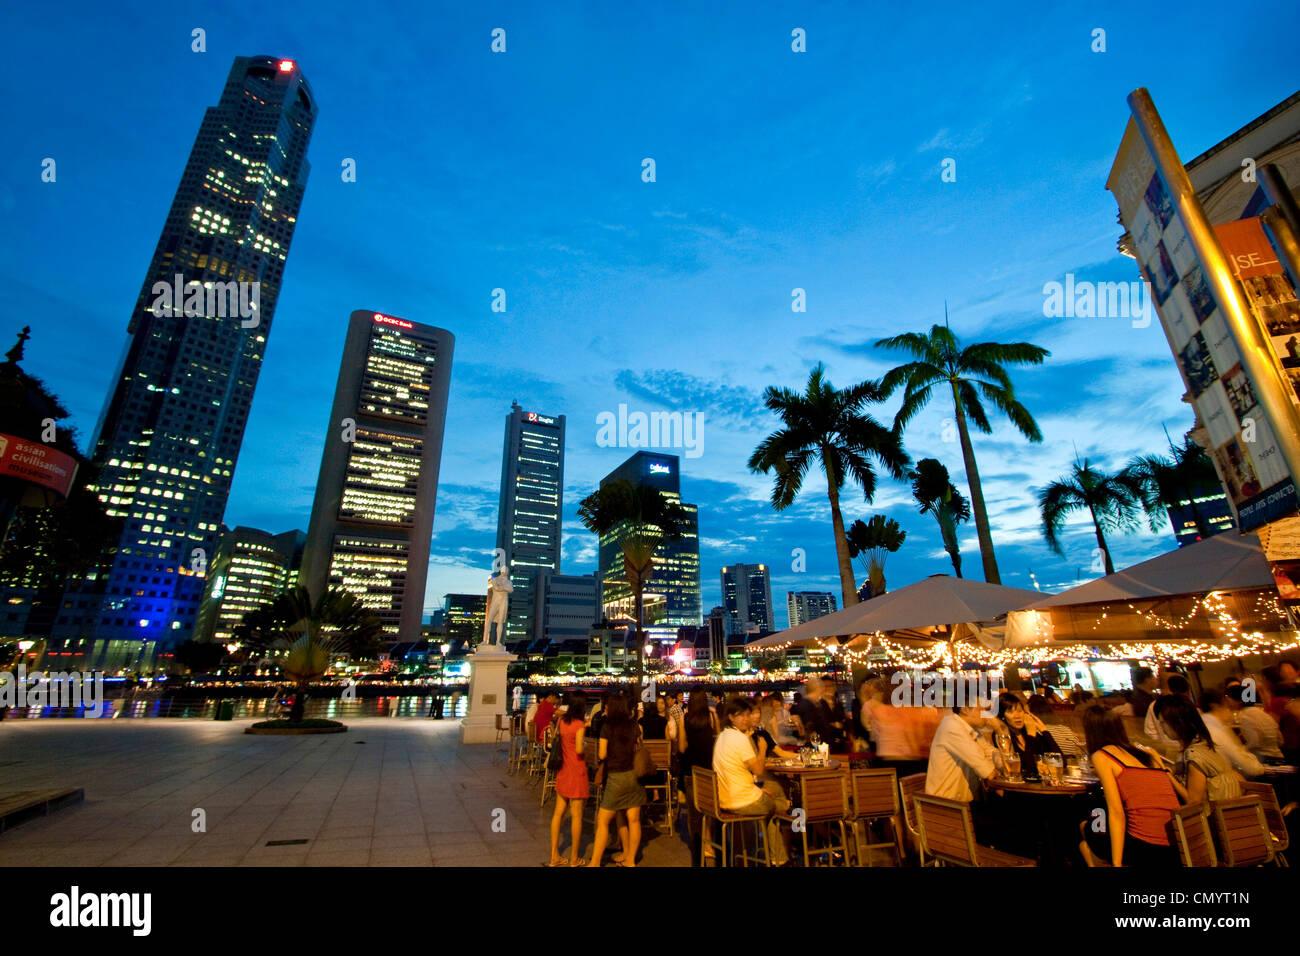 Skyline von Singapur, Raffles Statue, Straßencafé, Südost-Asien, twilight Stockfoto